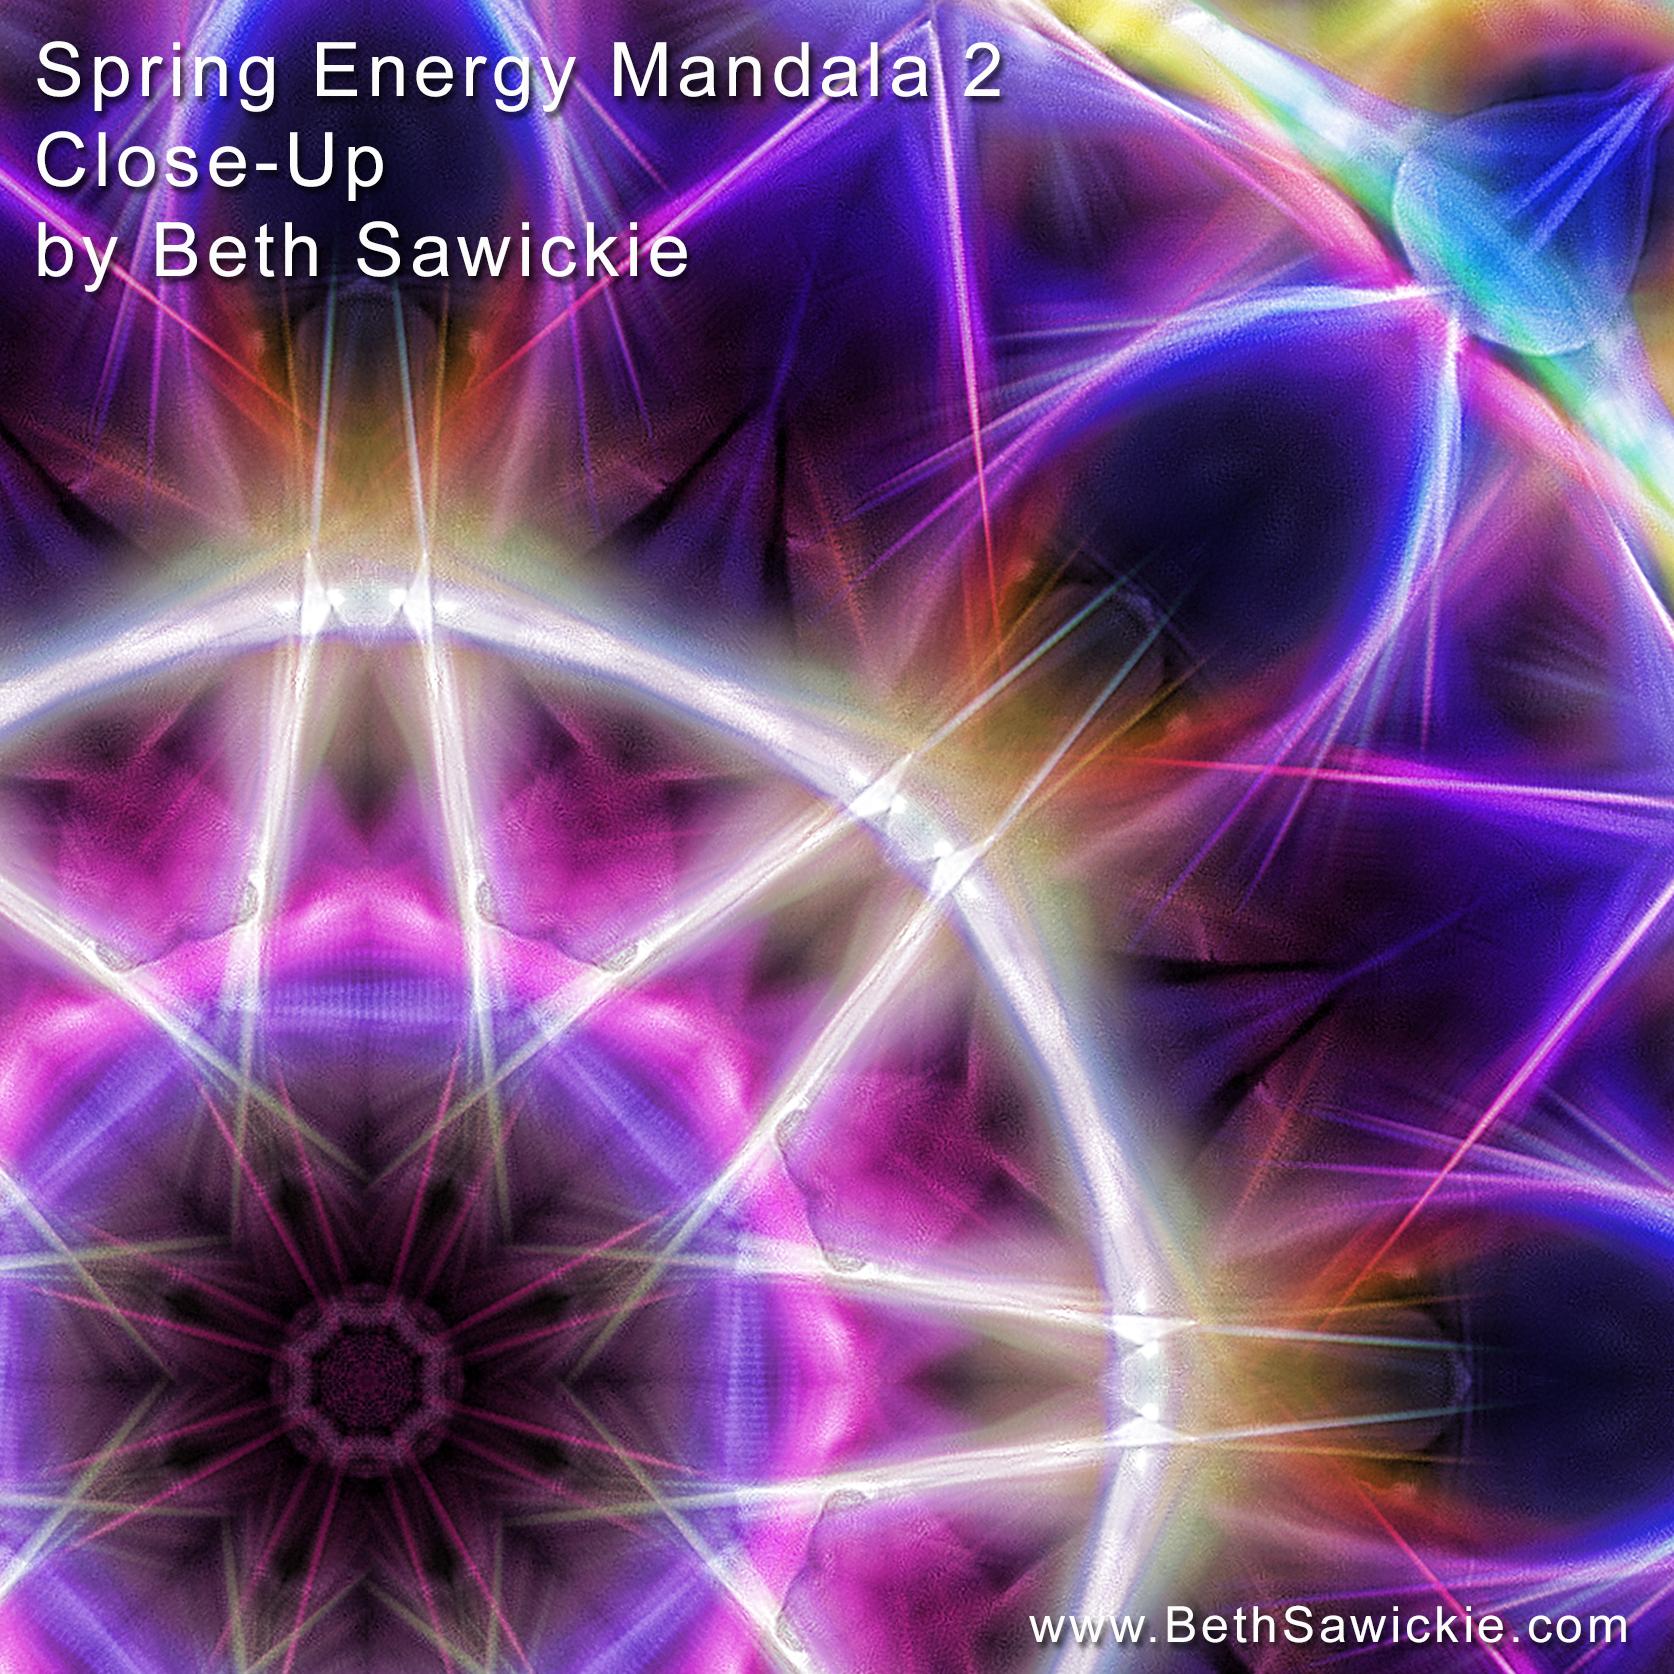 Spring Energy Mandala 2 Close-Up by Beth Sawickie